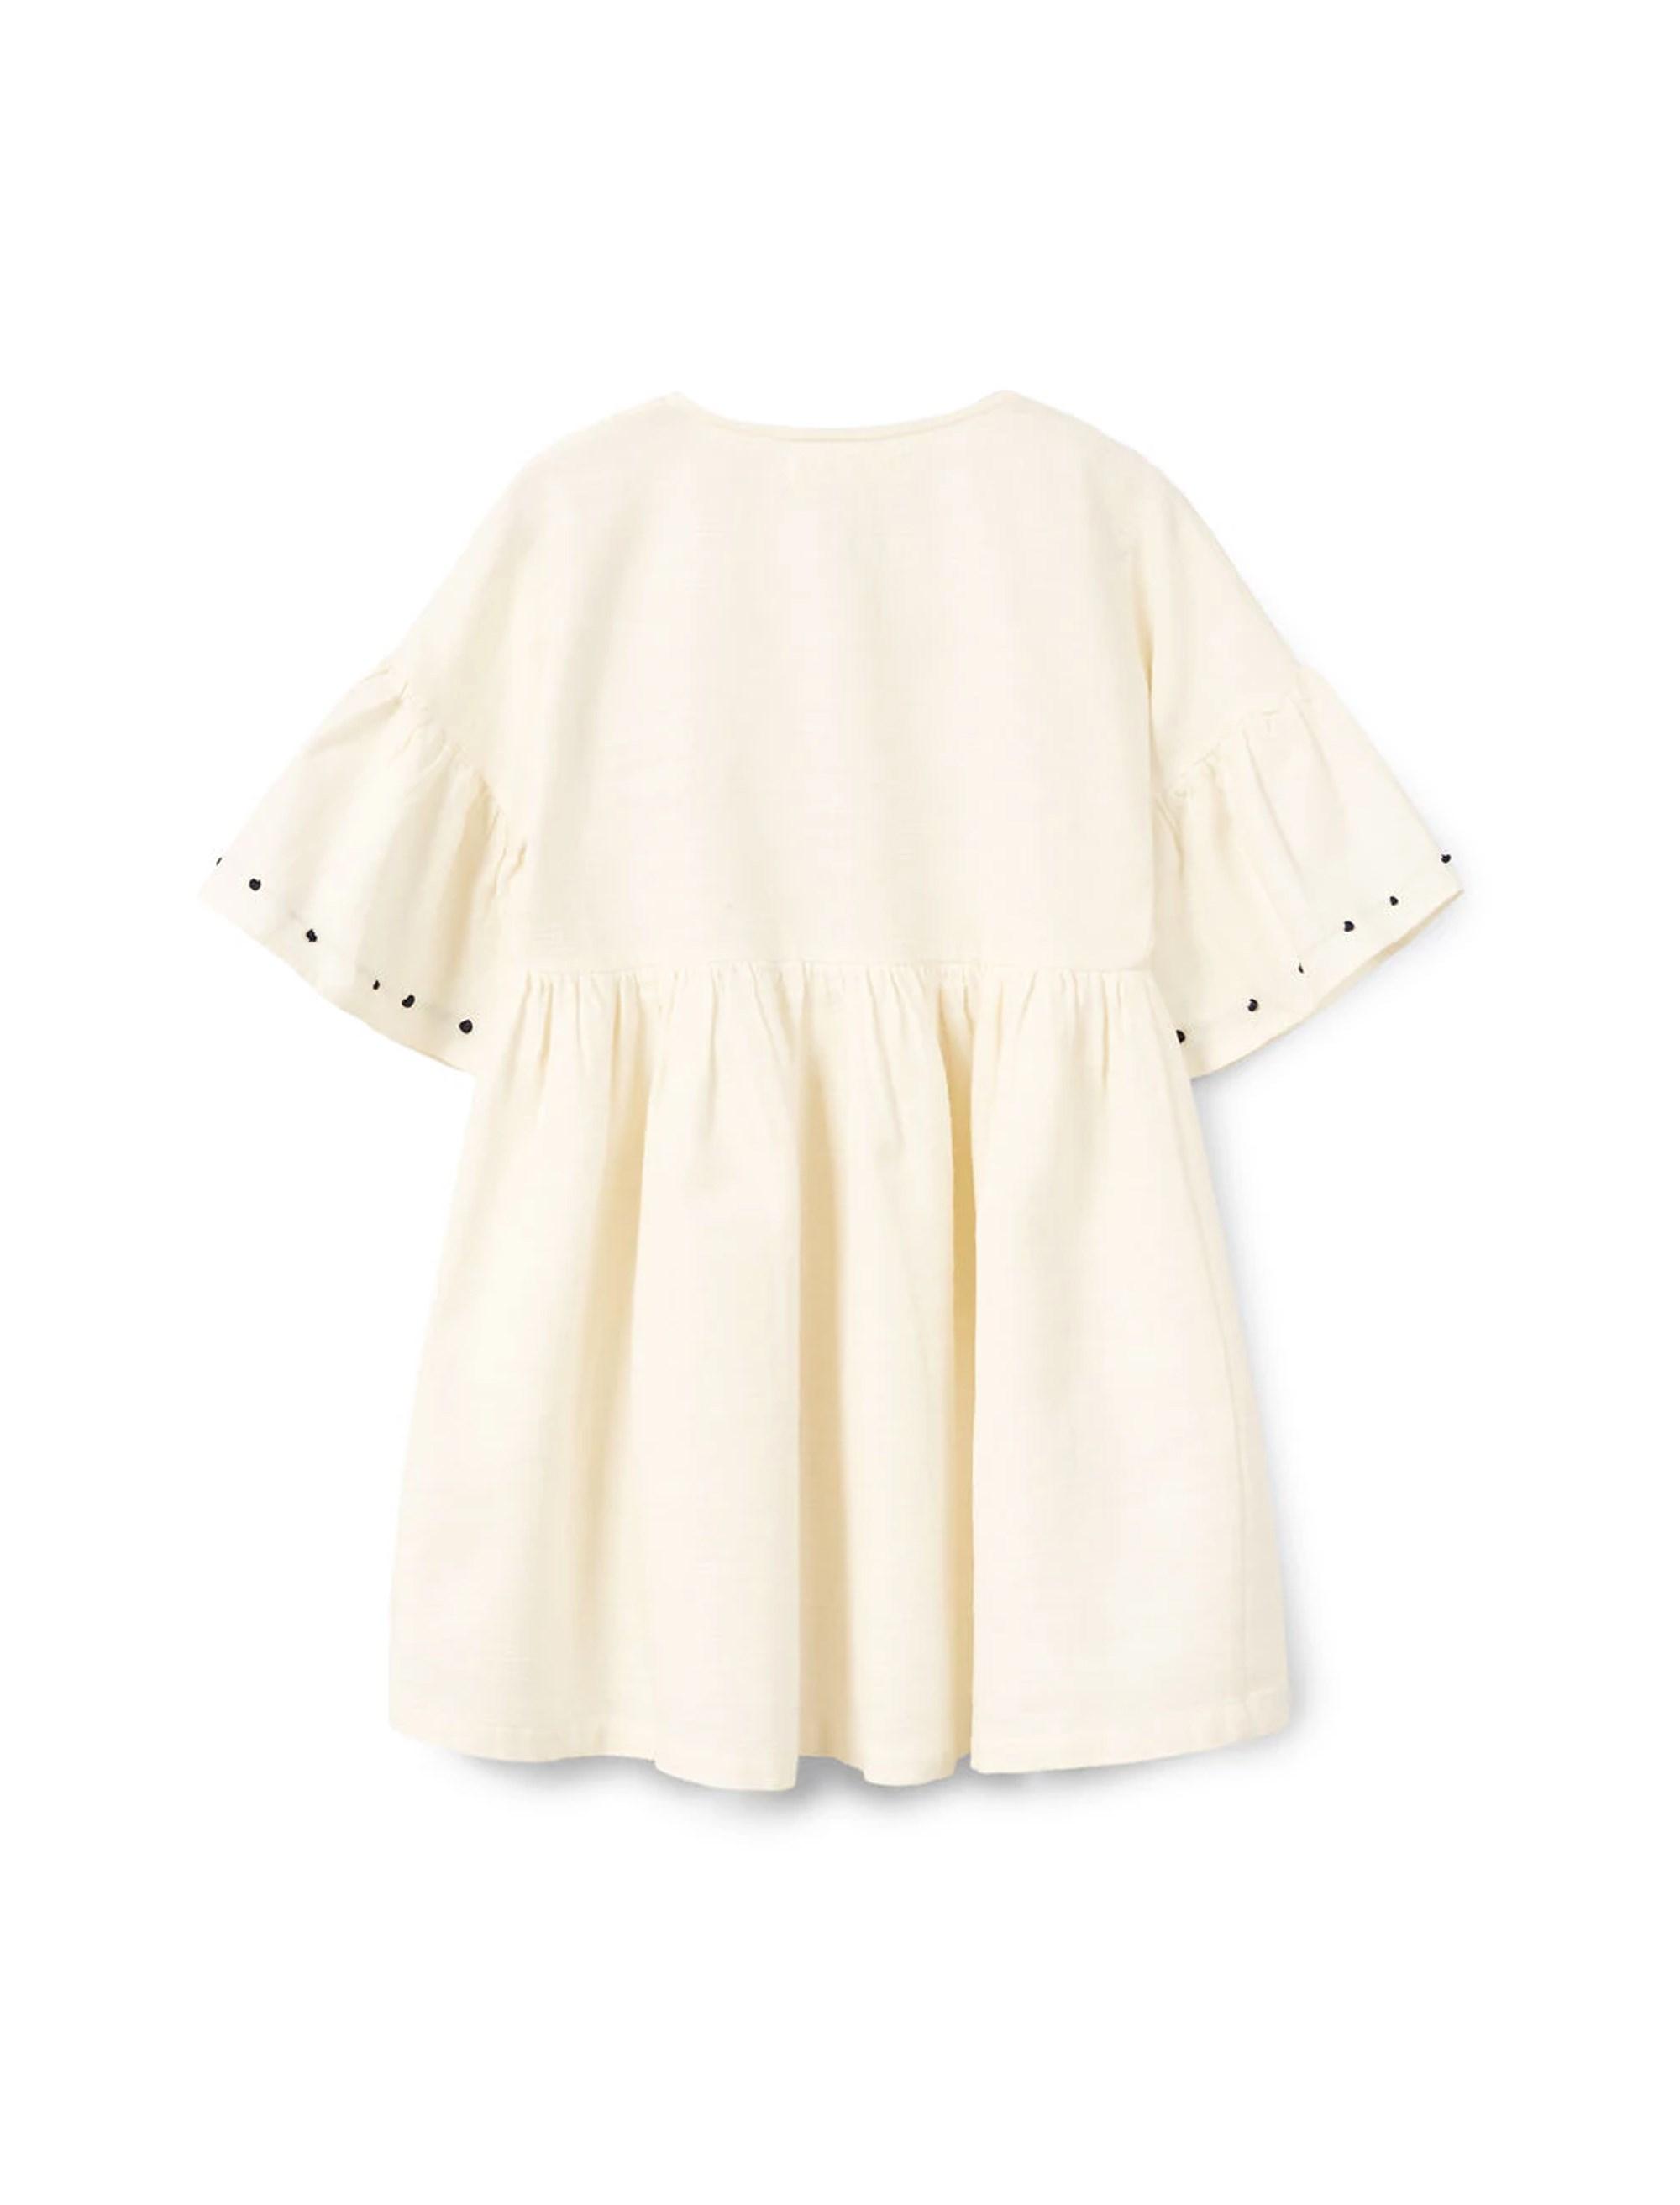 پیراهن نخی روزمره دخترانه - مانگو - سفيد - 2